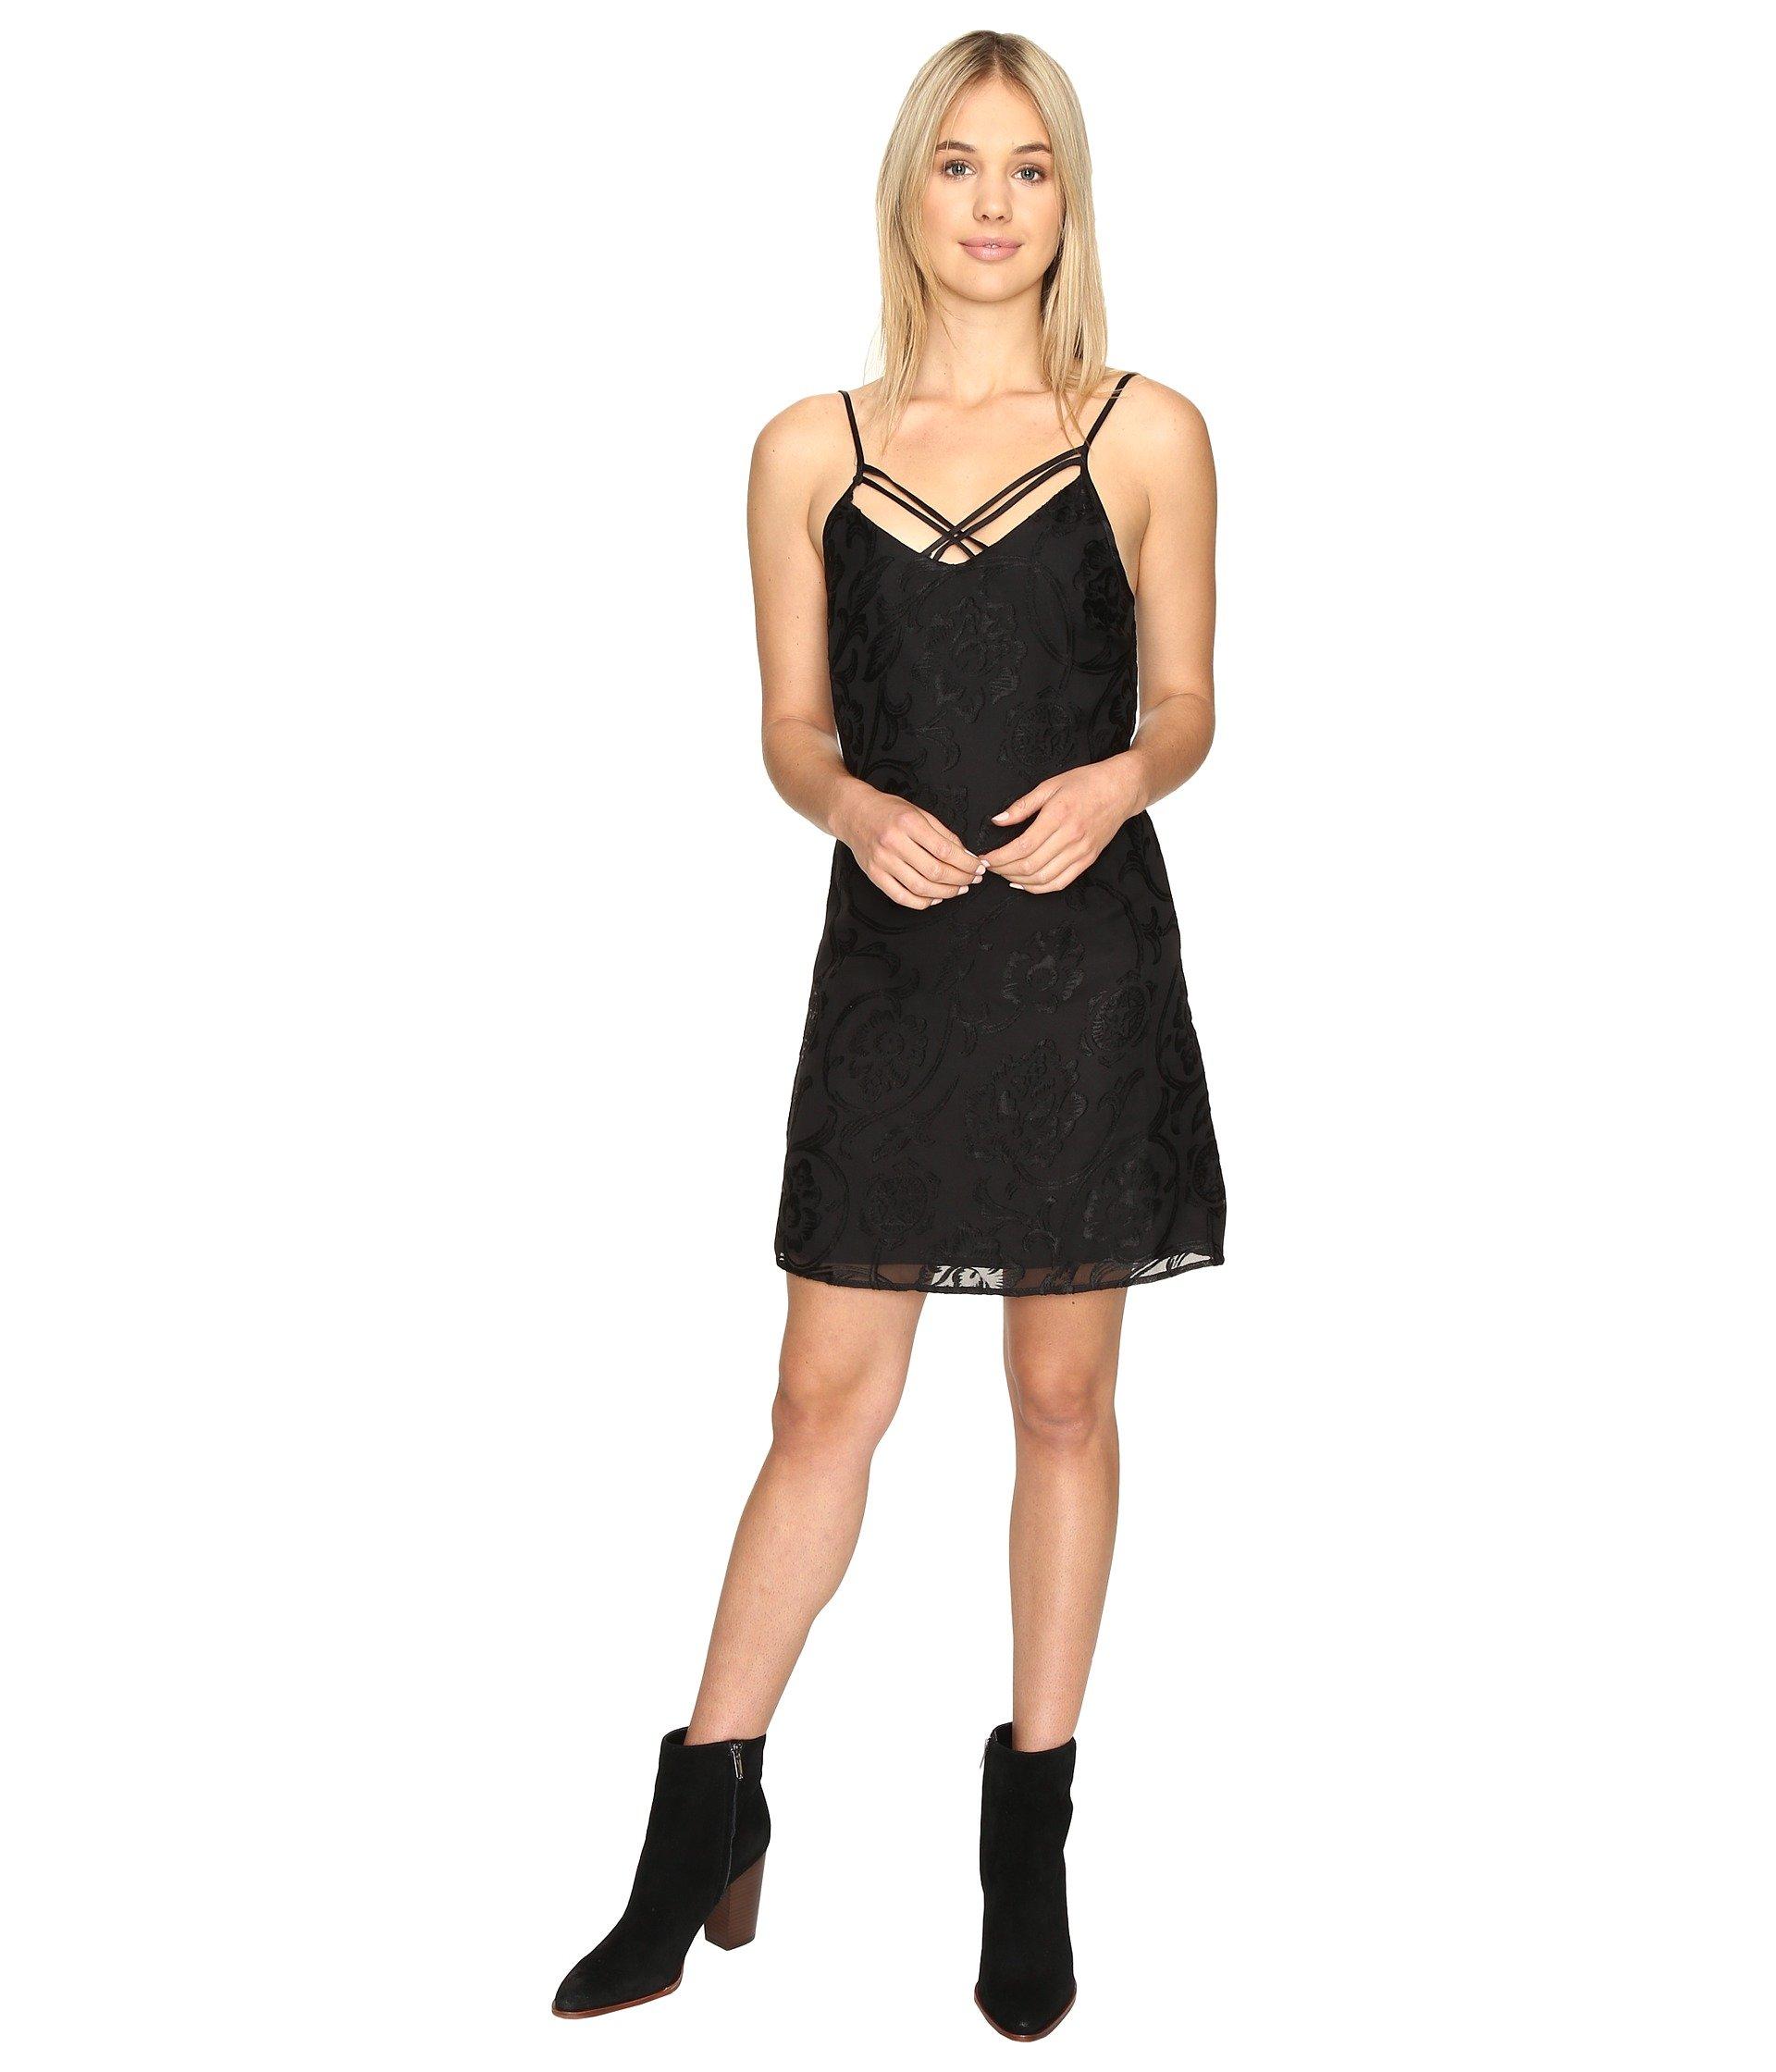 Amanda Slip Dress